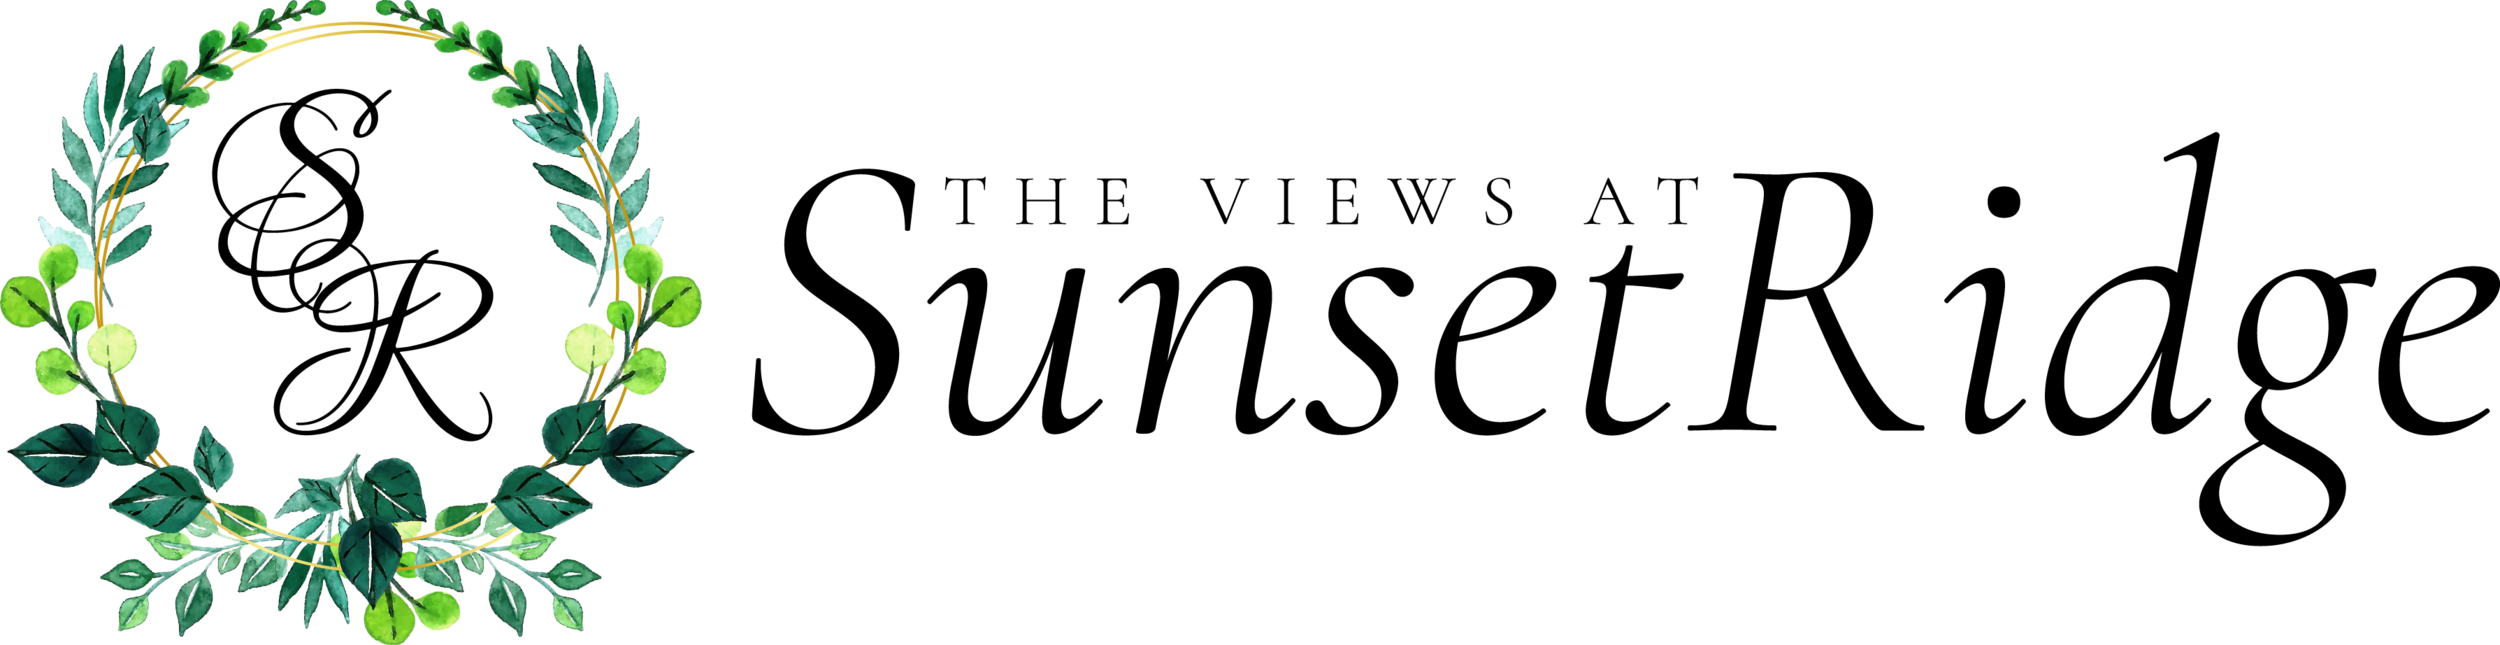 Copy of sunset ridge logo - v5.png